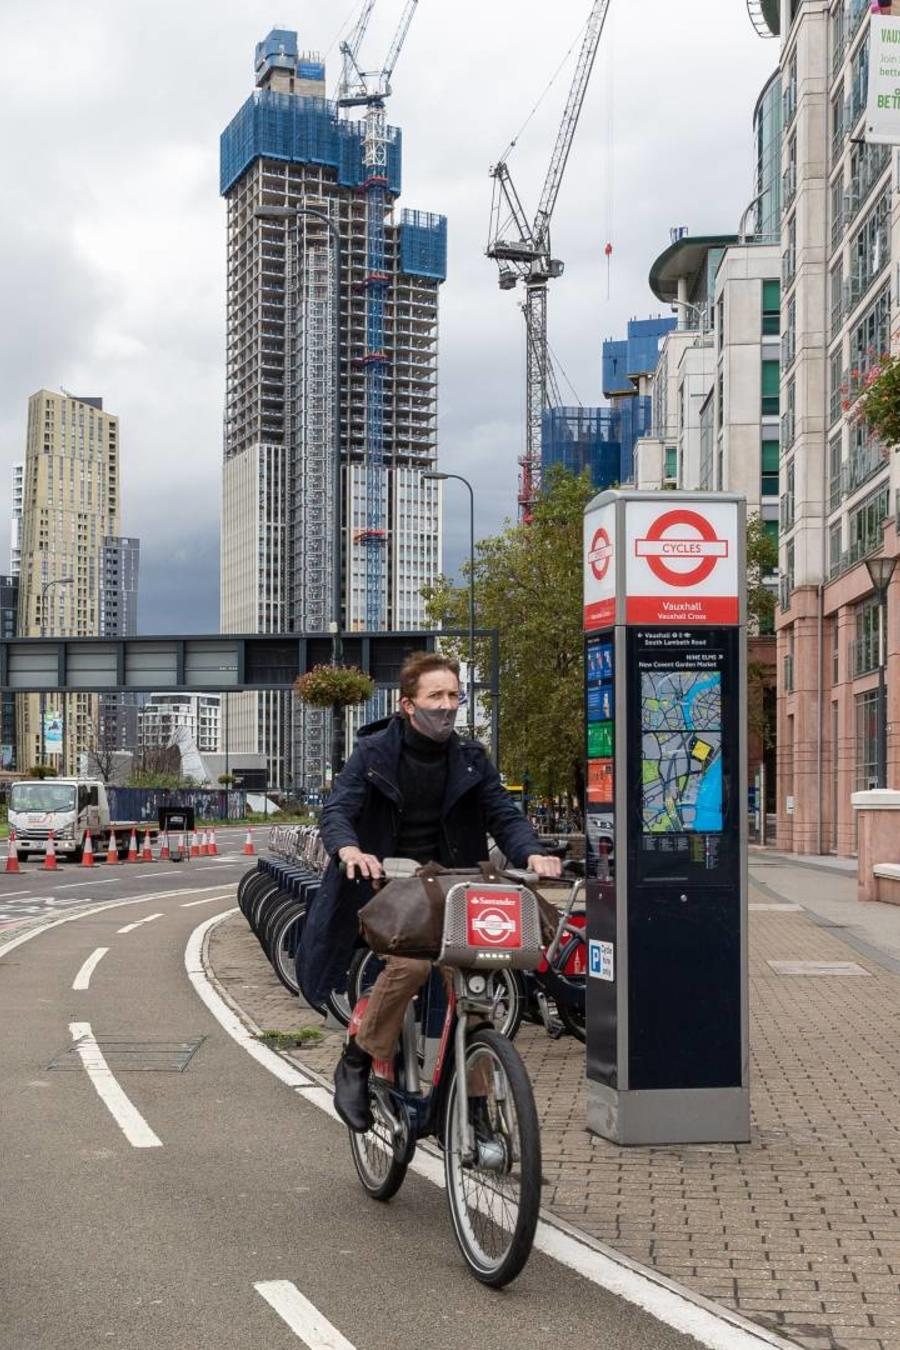 Hombre en bicicleta en Londres